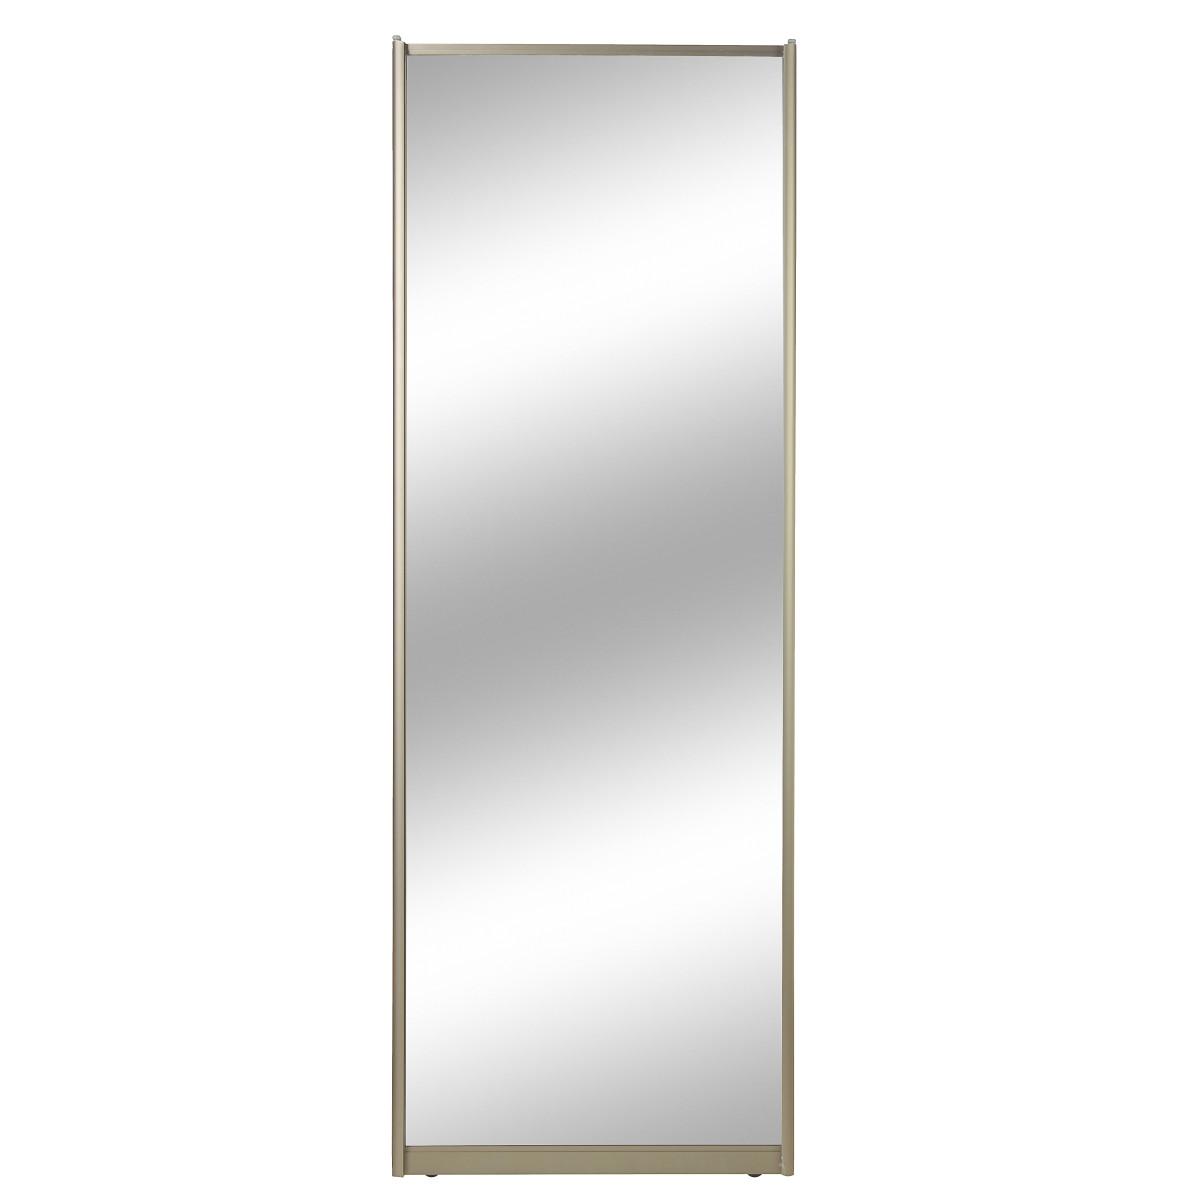 Дверь-купе  2555х904 Зеркало/шампань